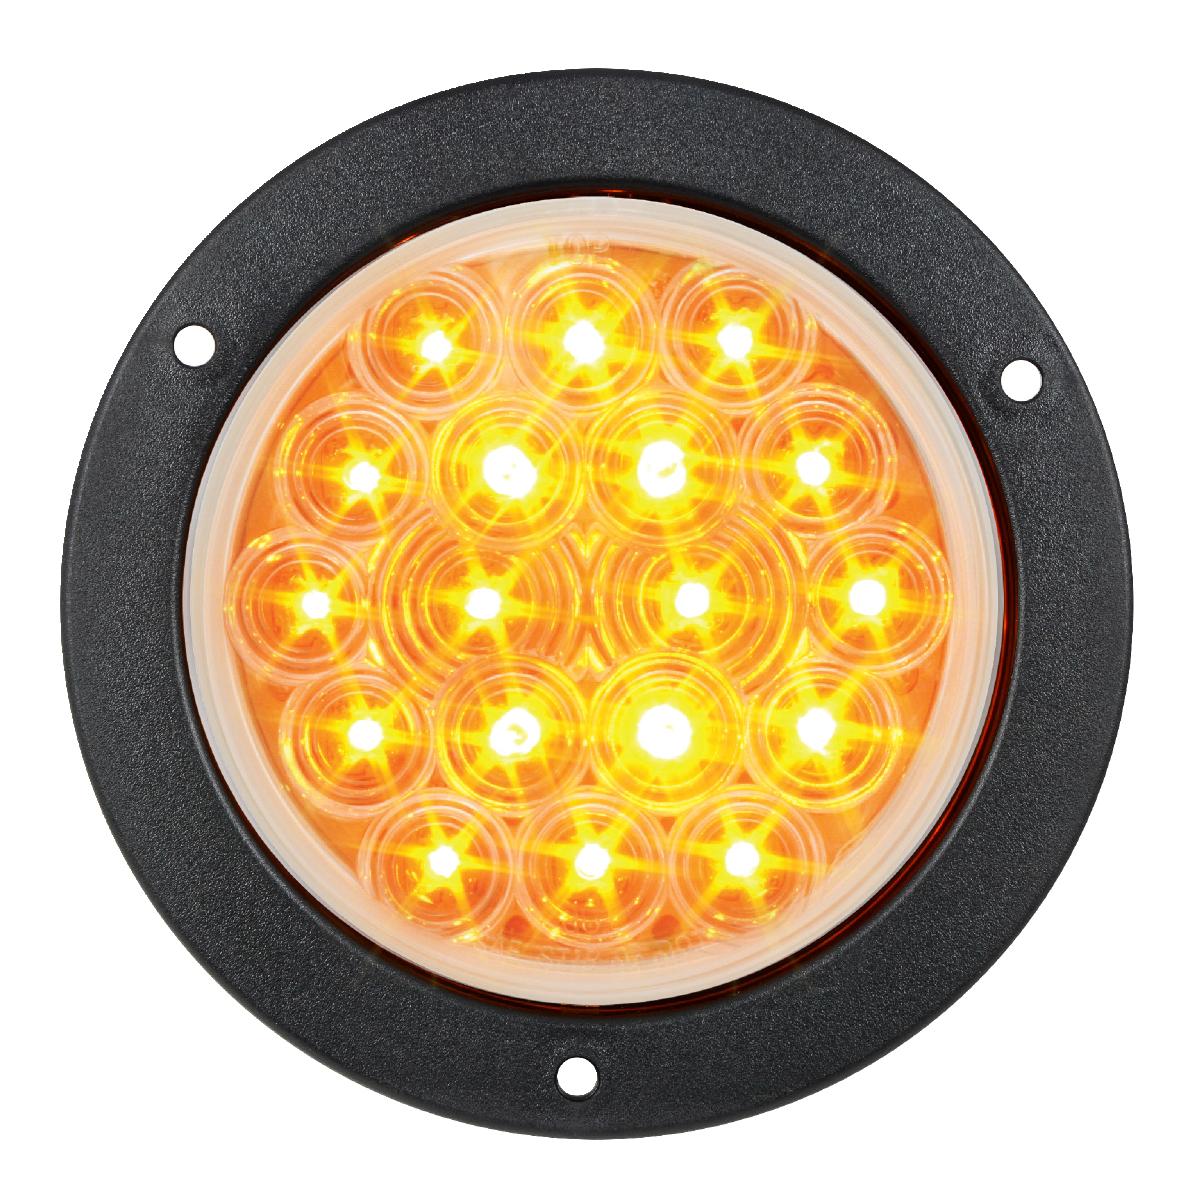 "75891 4"" Fleet LED Light with Black Flange Mount in 3 Wires"